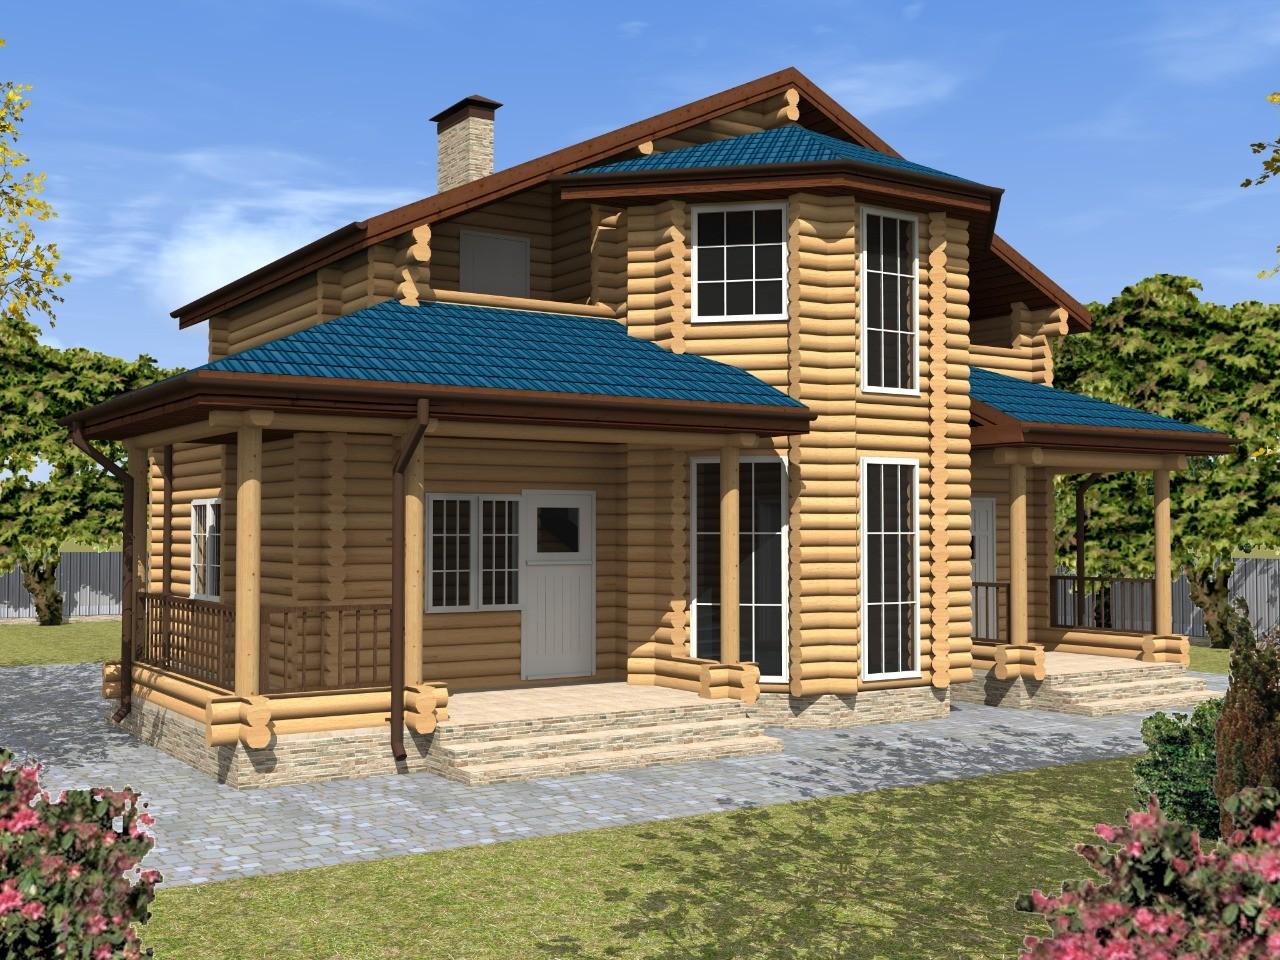 Проект деревянного дома 12 на 10